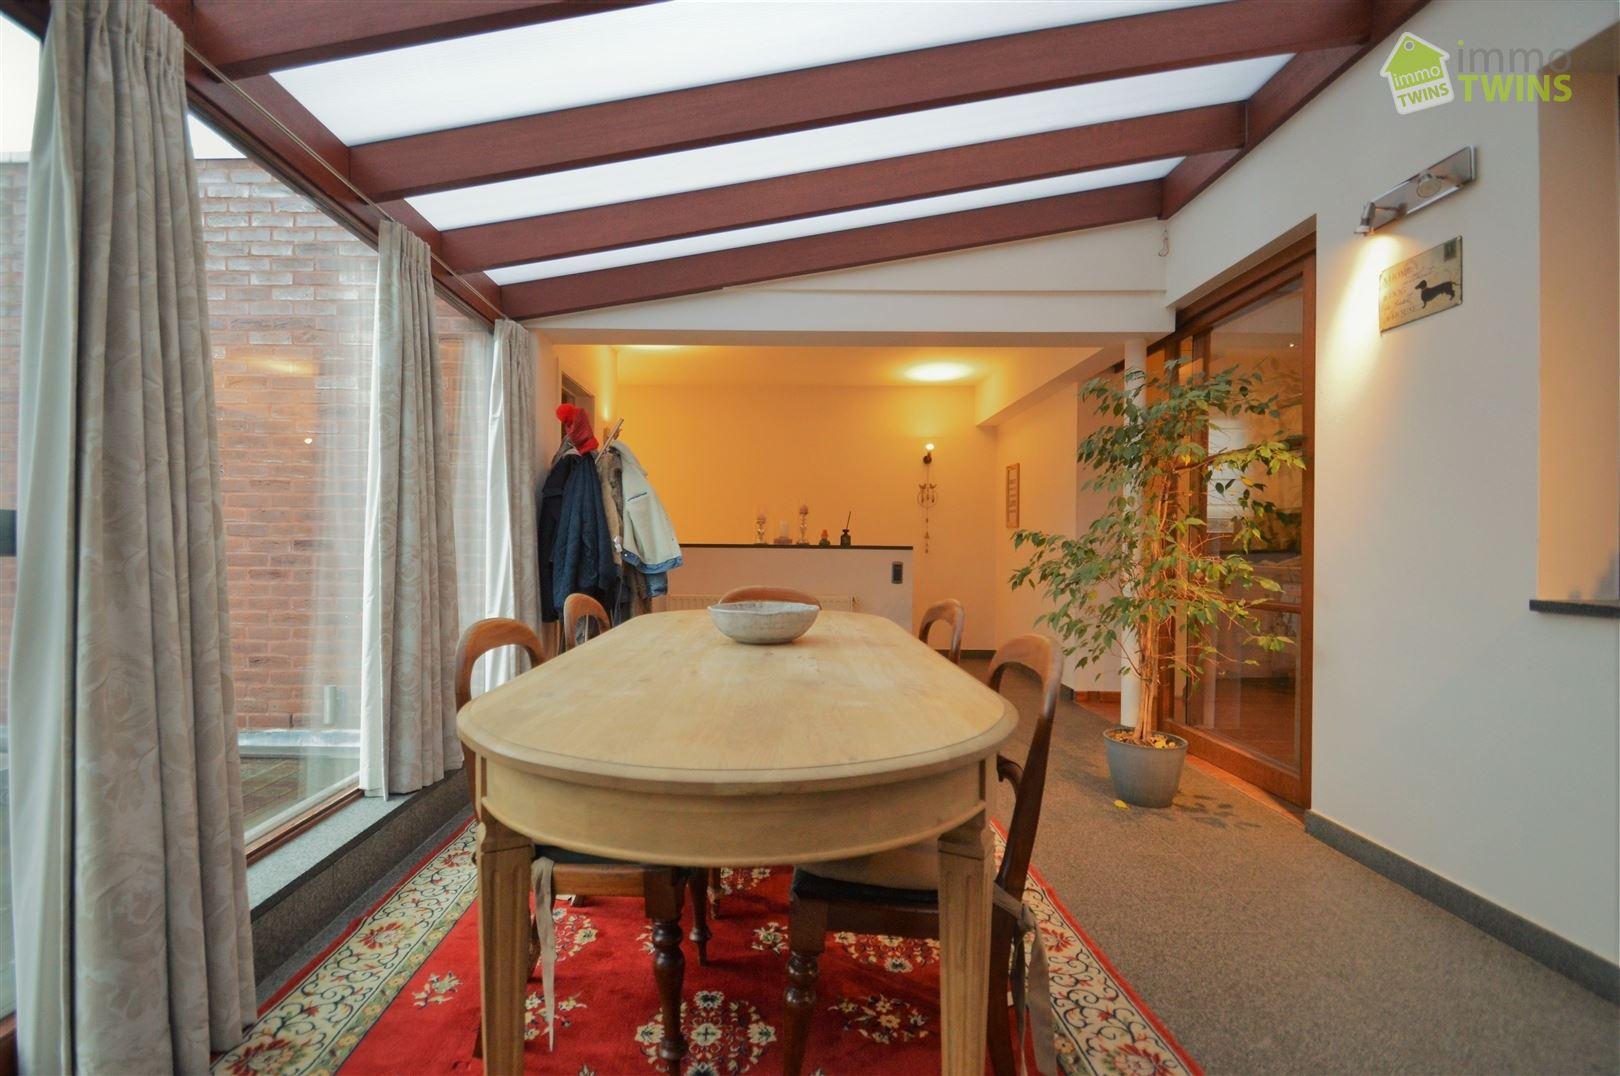 Foto 10 : Duplex/Penthouse te 2890 SINT-AMANDS (België) - Prijs € 449.000